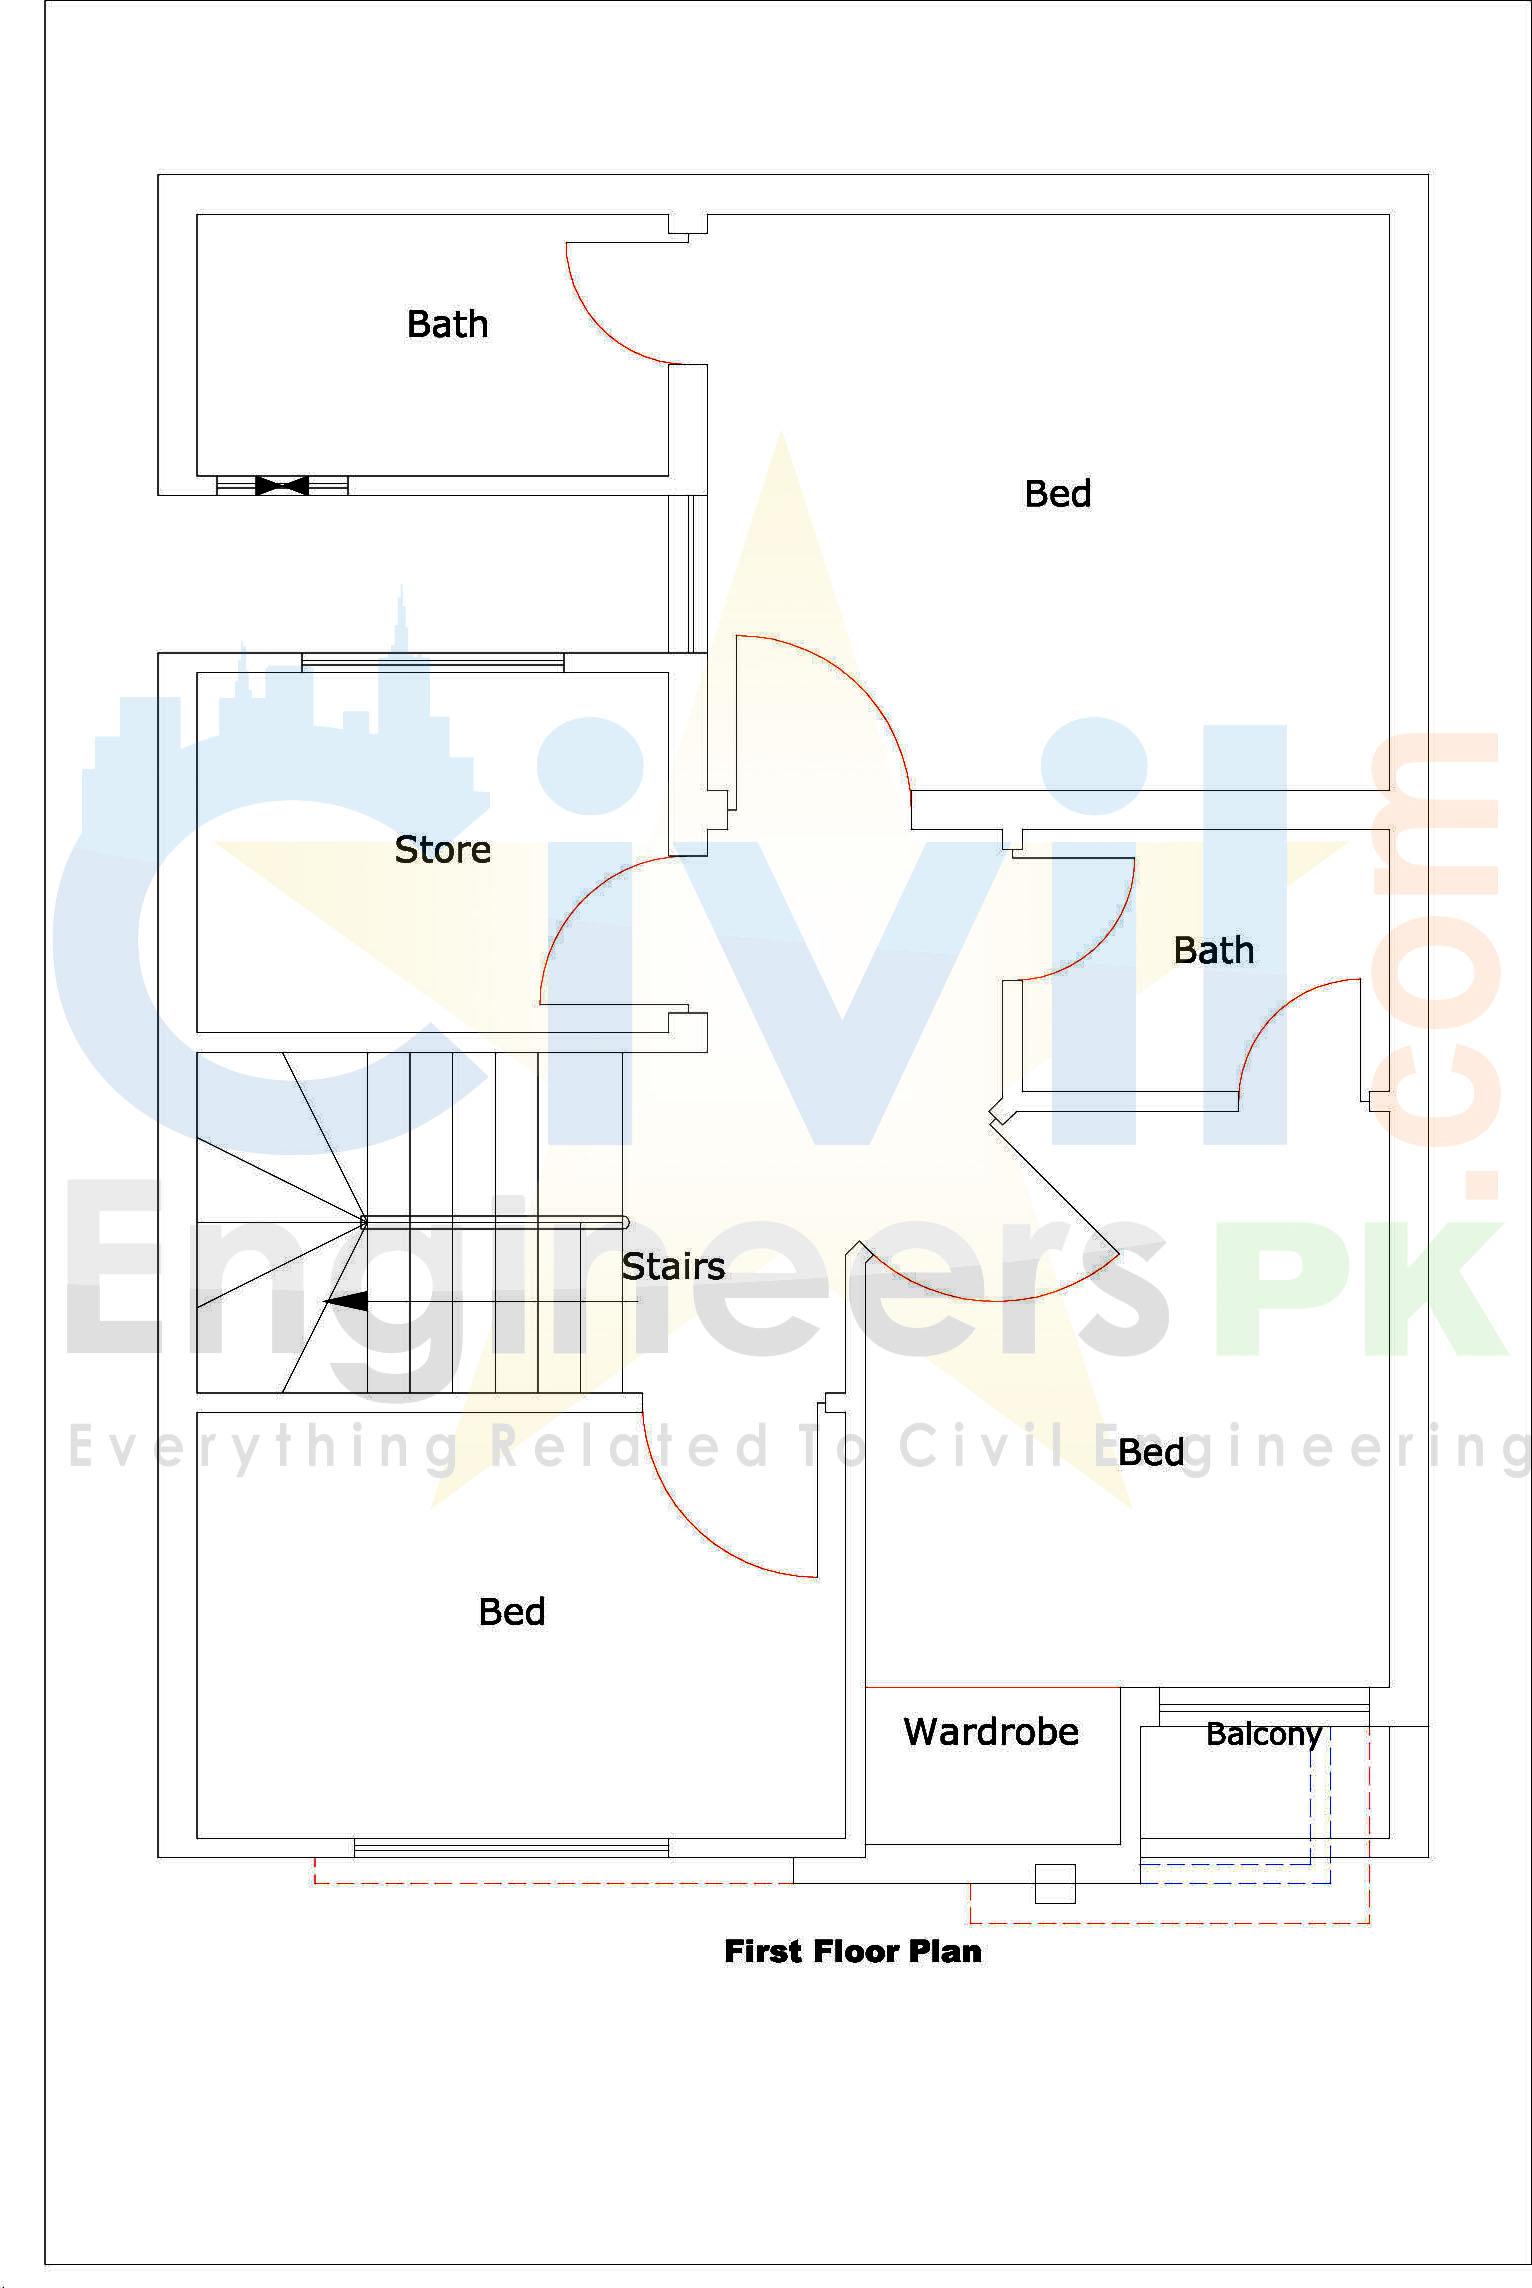 new 3 marla house design civil engineers pk new 3 marla house design 3 marla house front view 3d